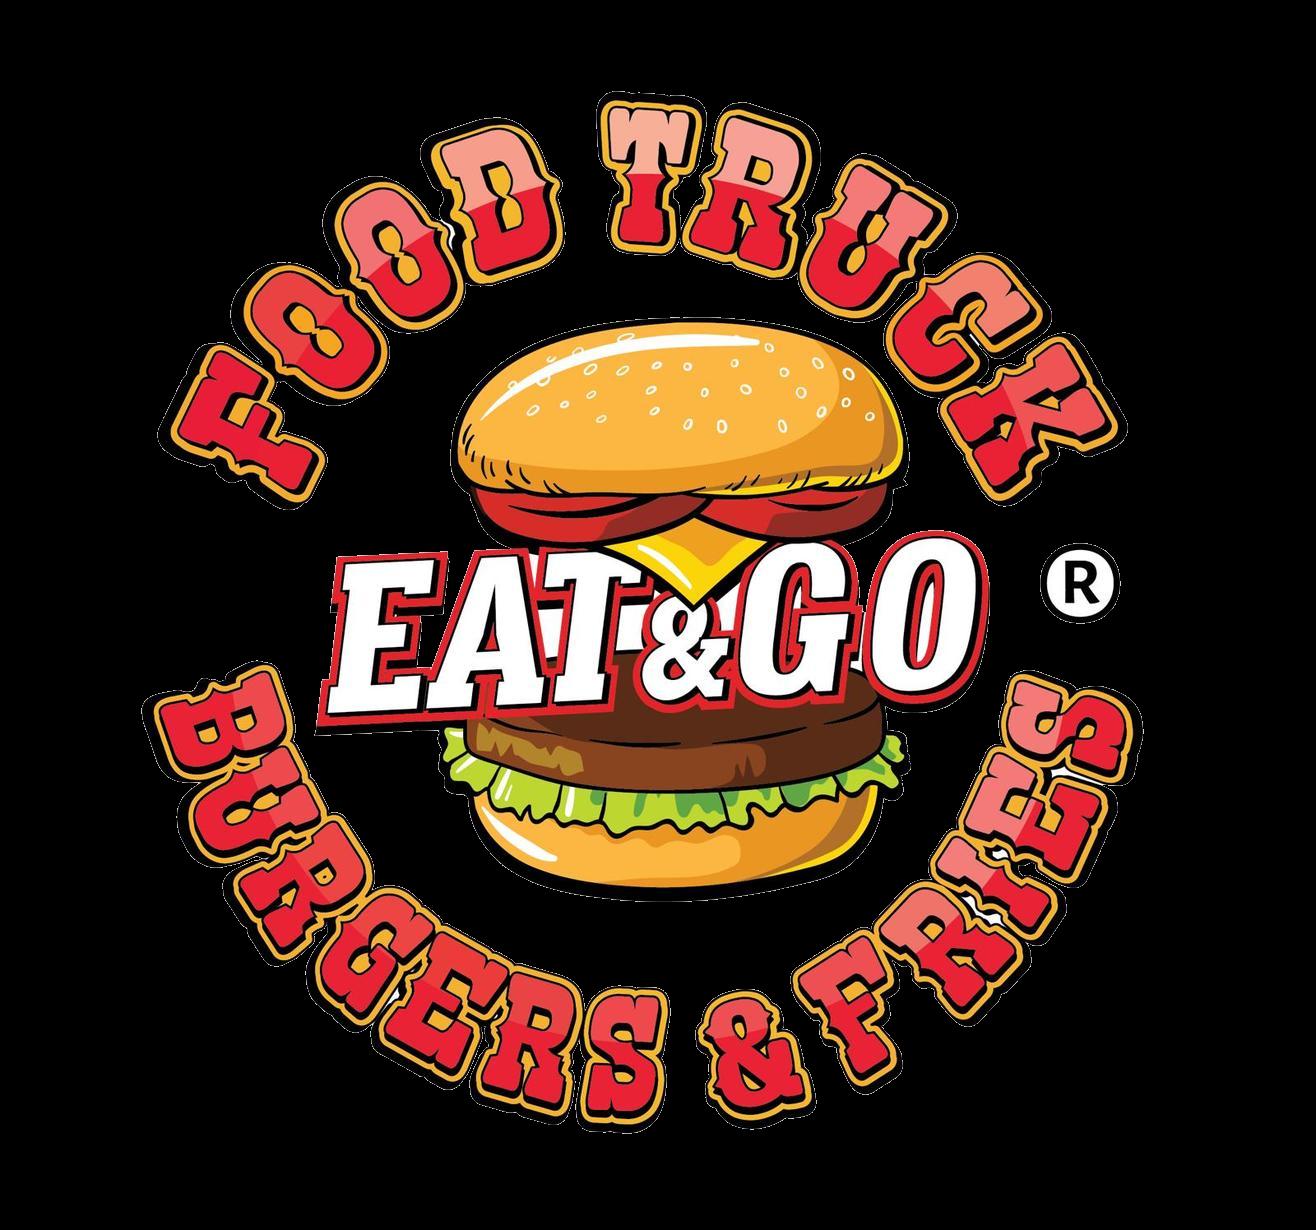 Food Truck Eat&Go